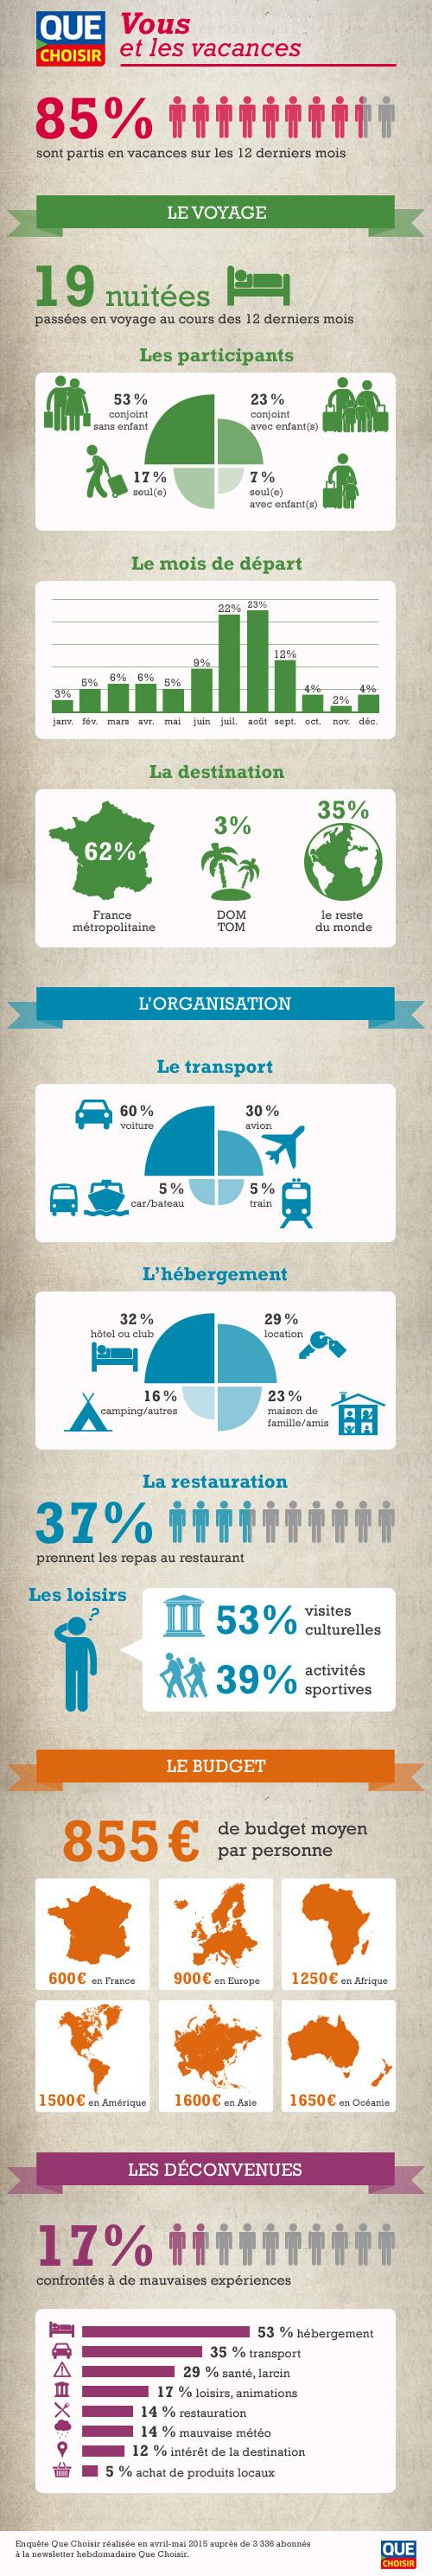 infographie-vacances